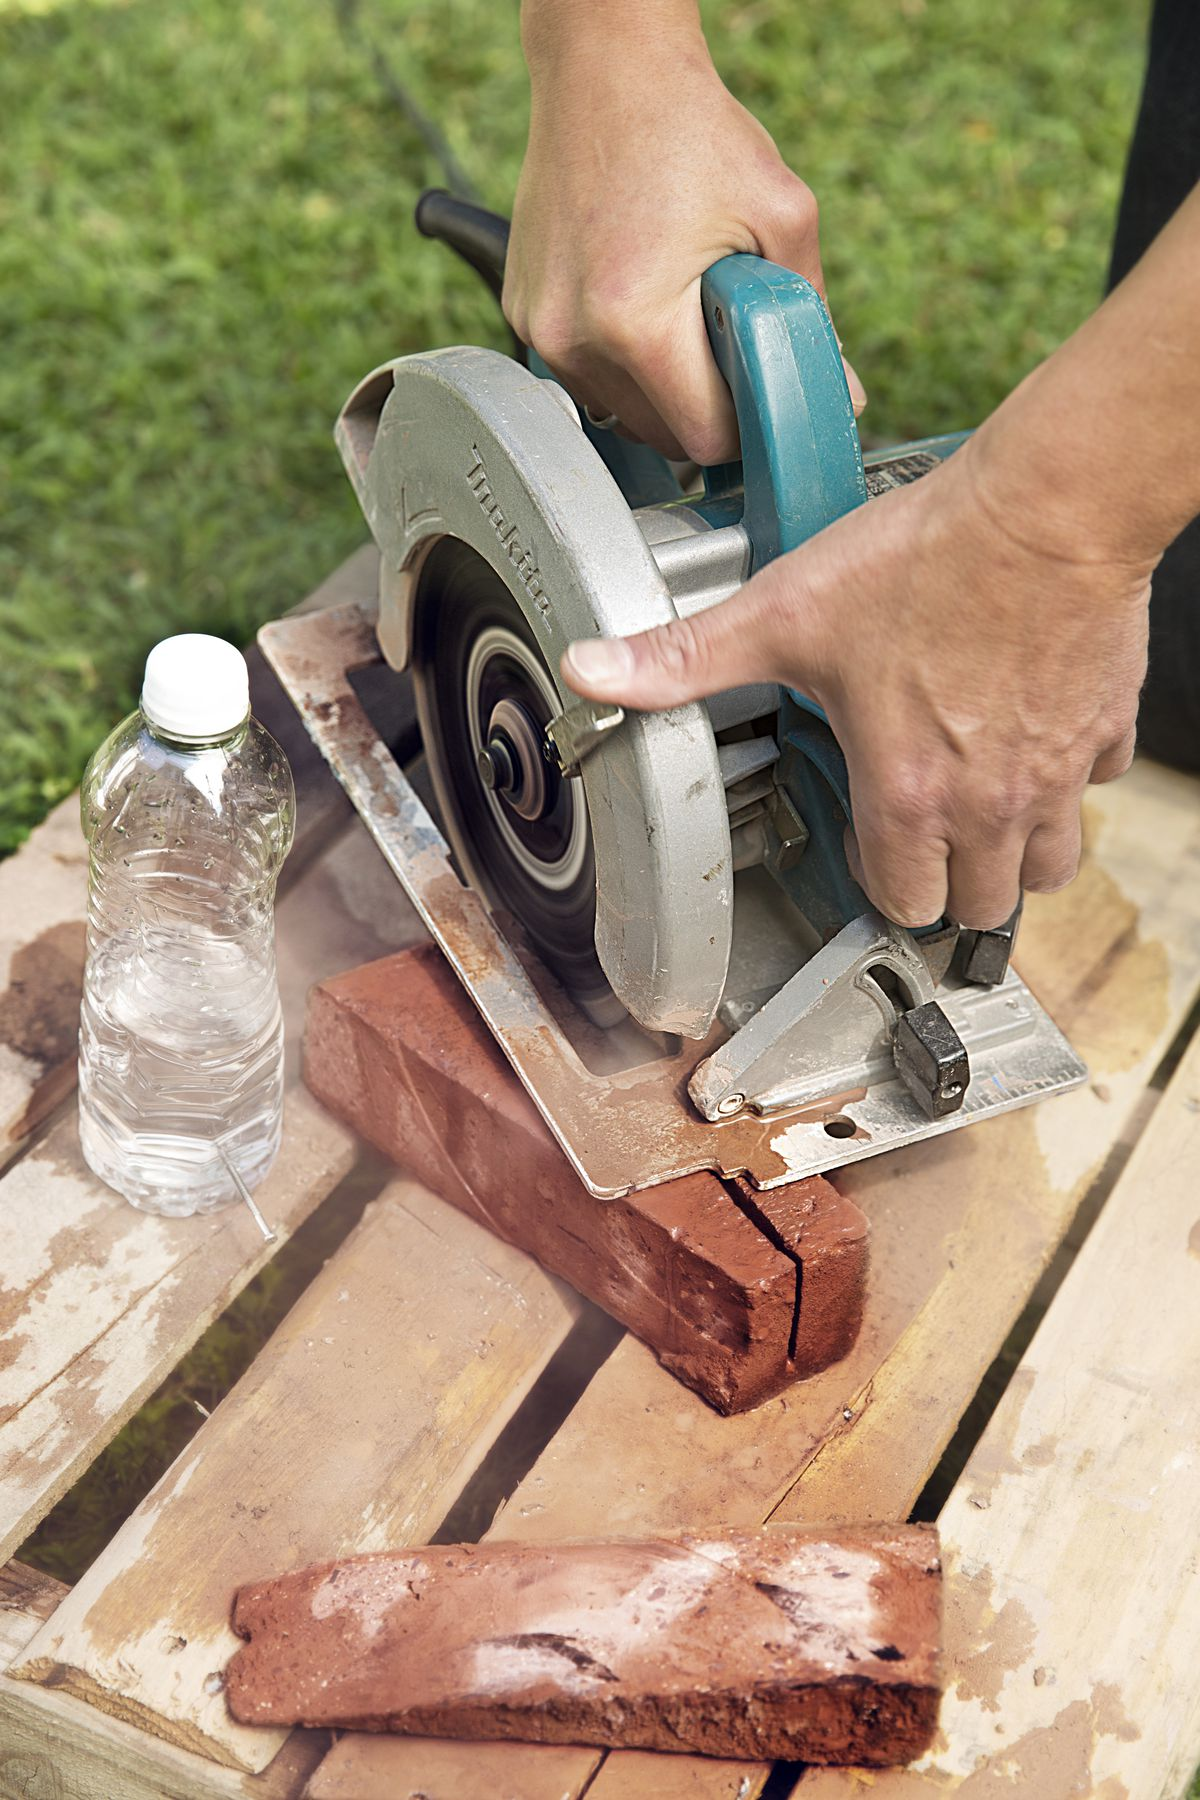 Man Uses Circular Saw To Cut Through Marked Bricks For Brick Garden Edging